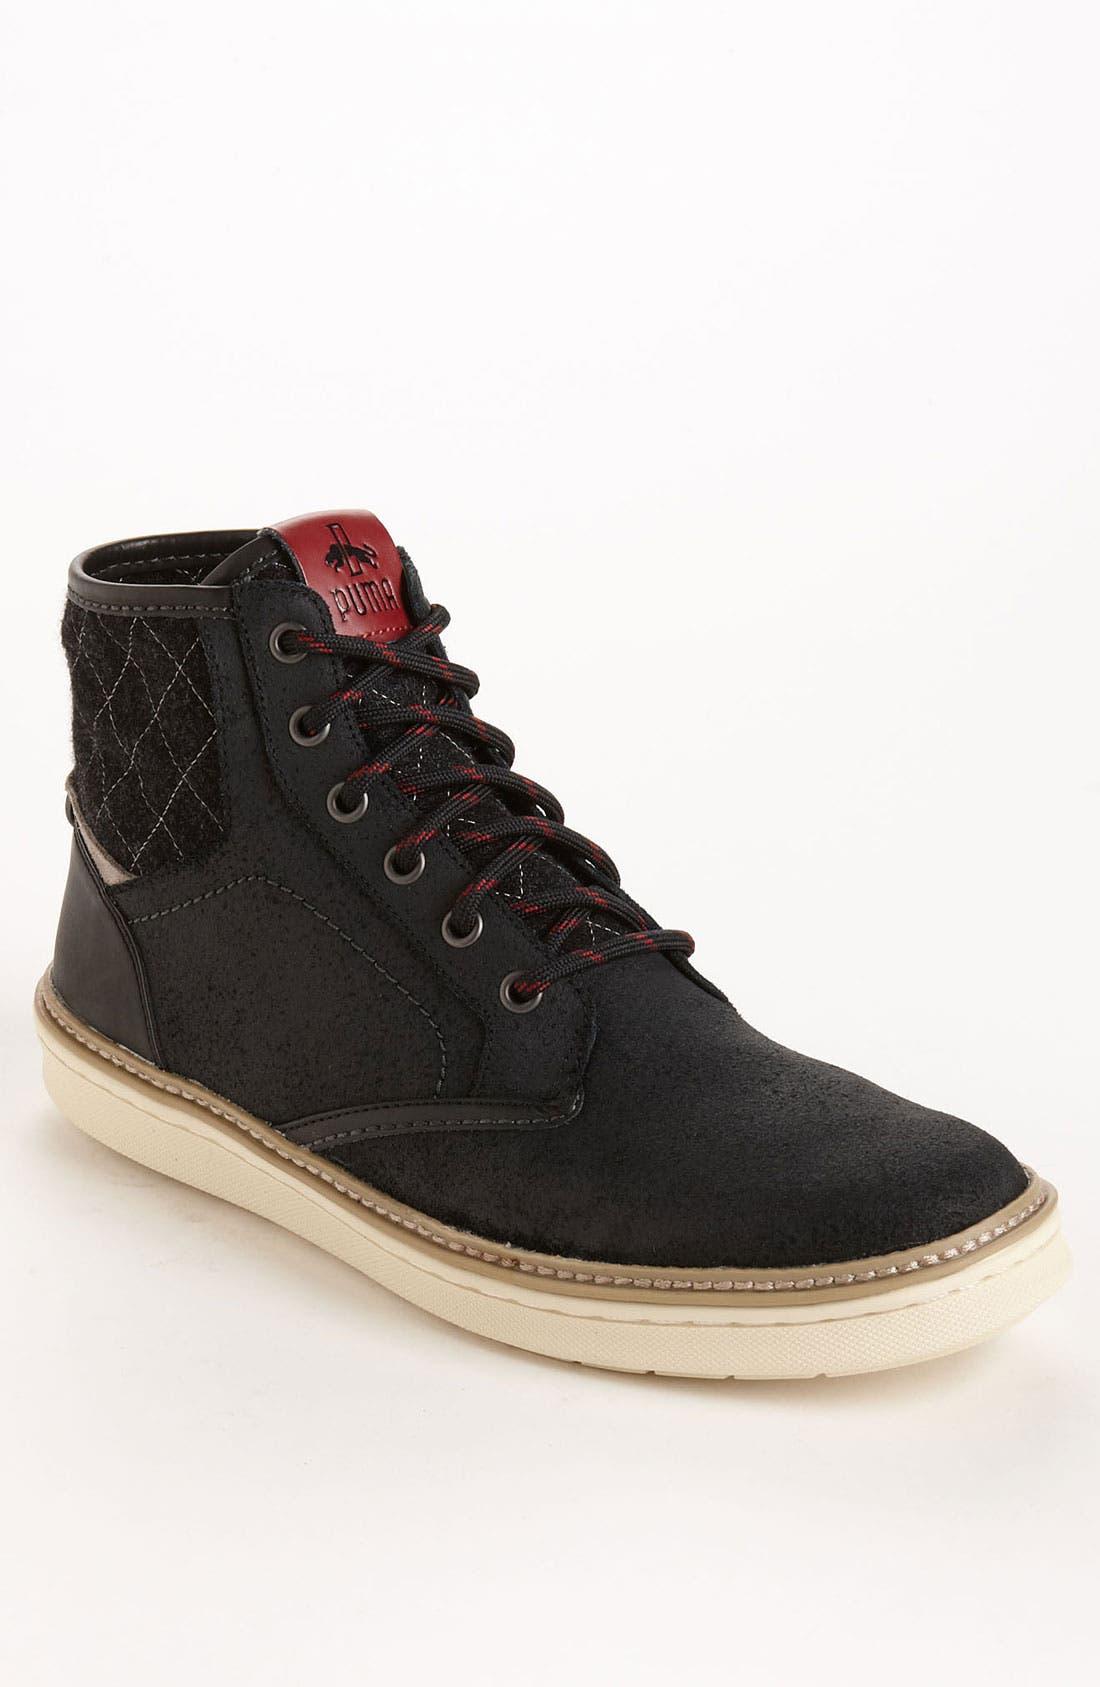 Main Image - PUMA 'Dassler - Chukka' Boot